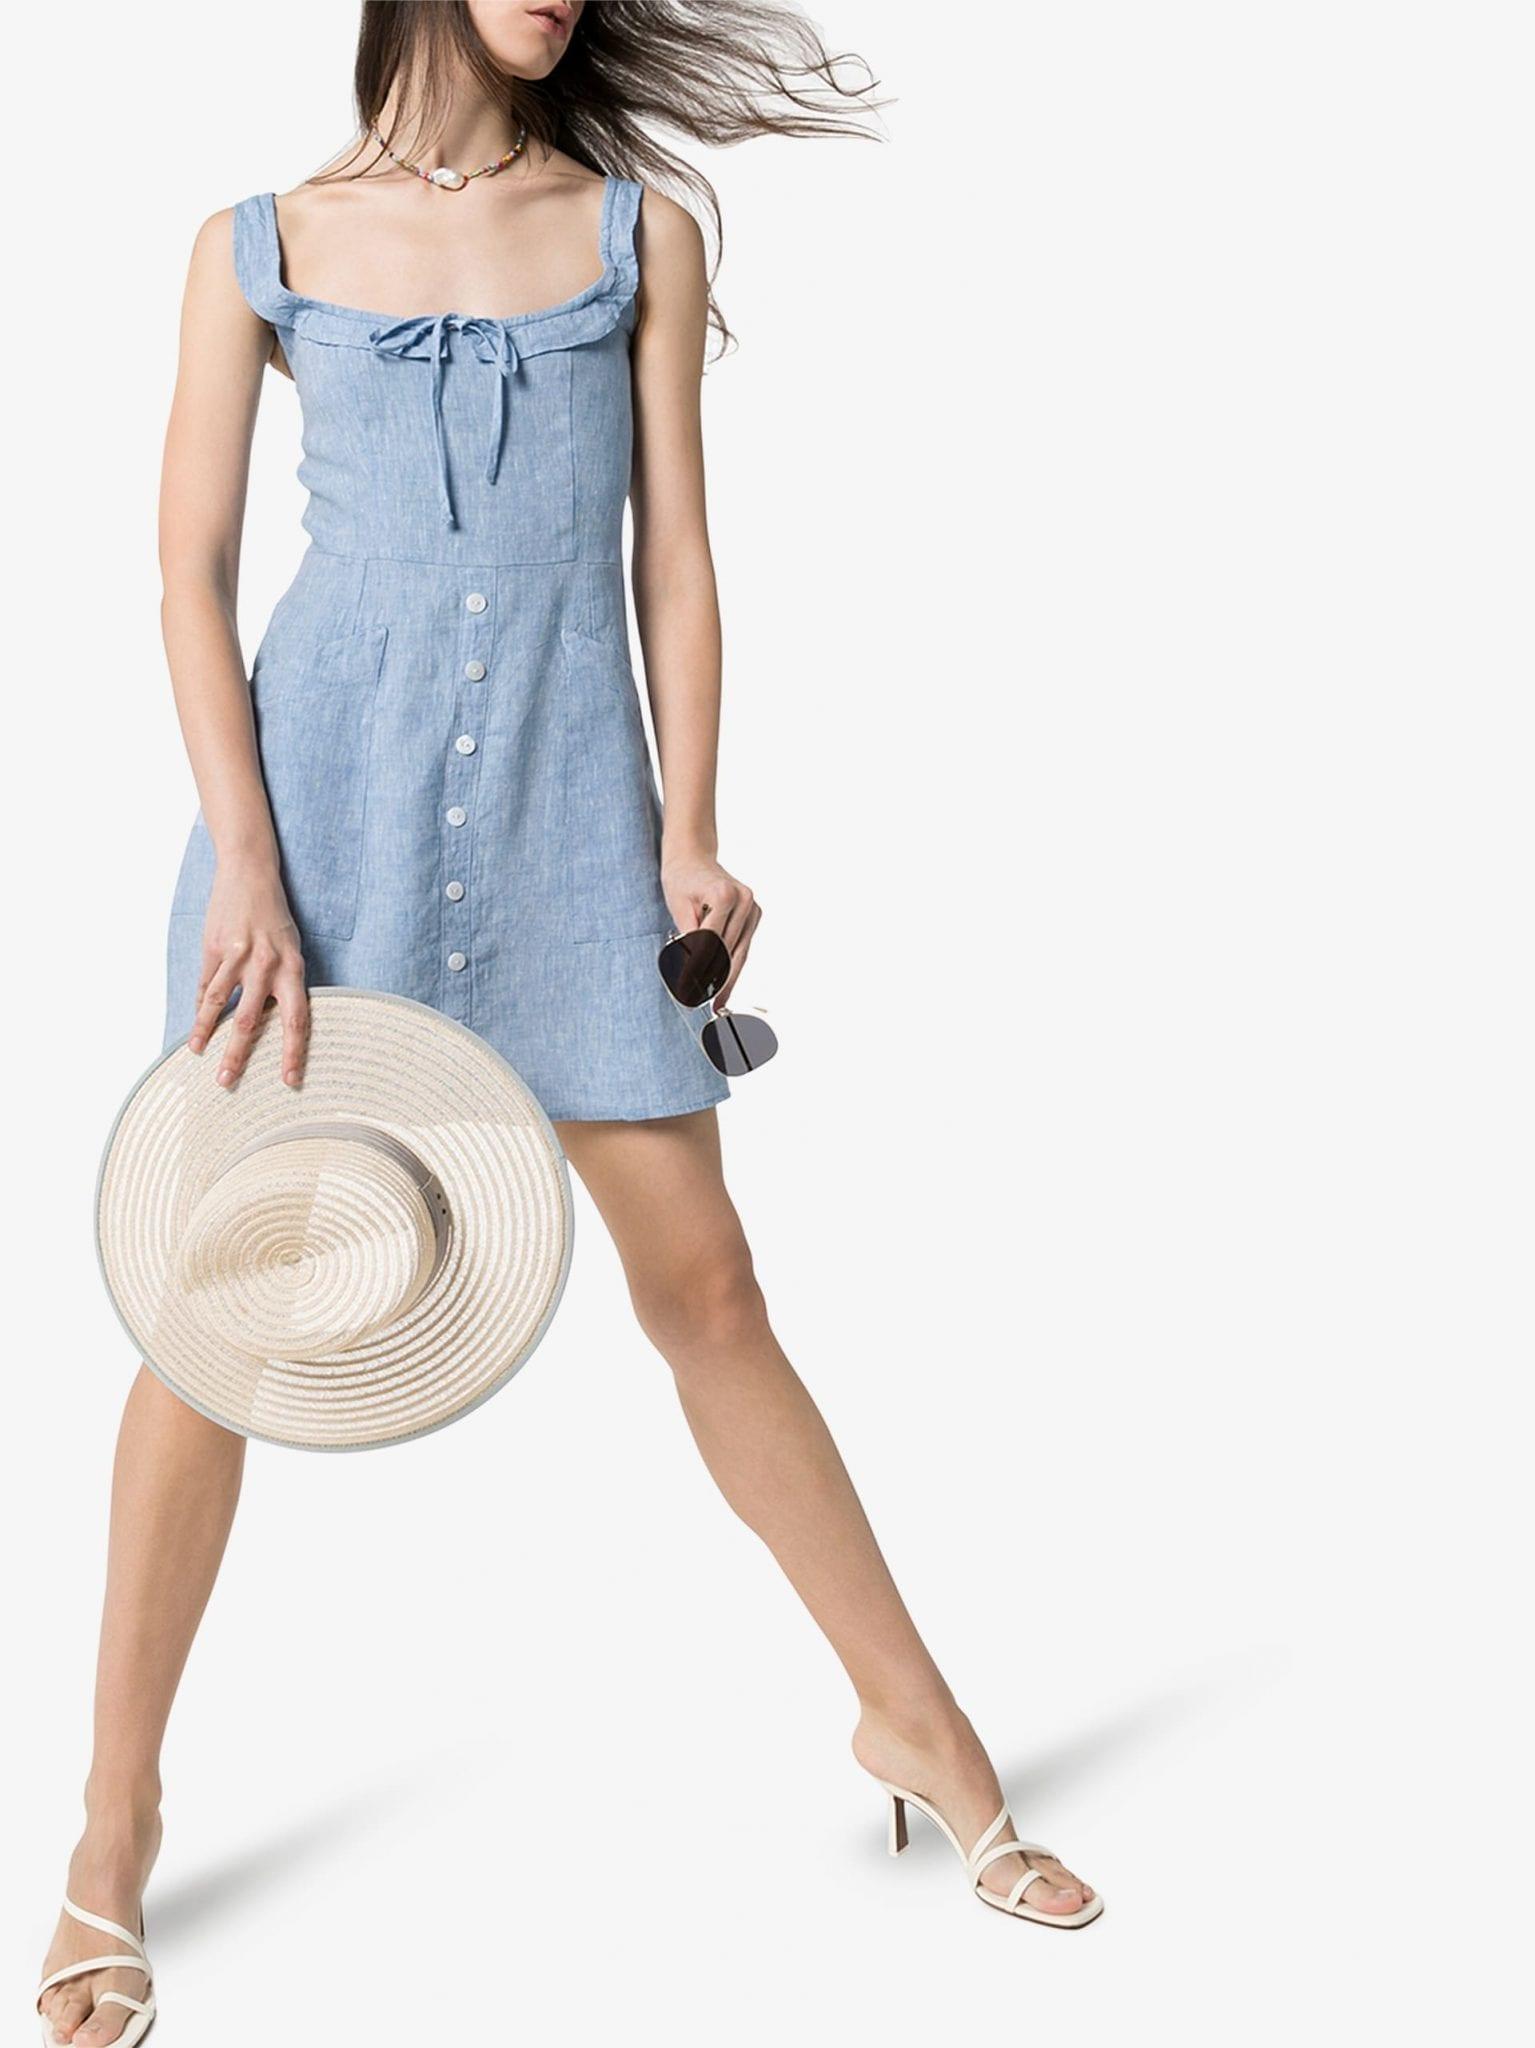 HONORINE Gigi Mini Dress